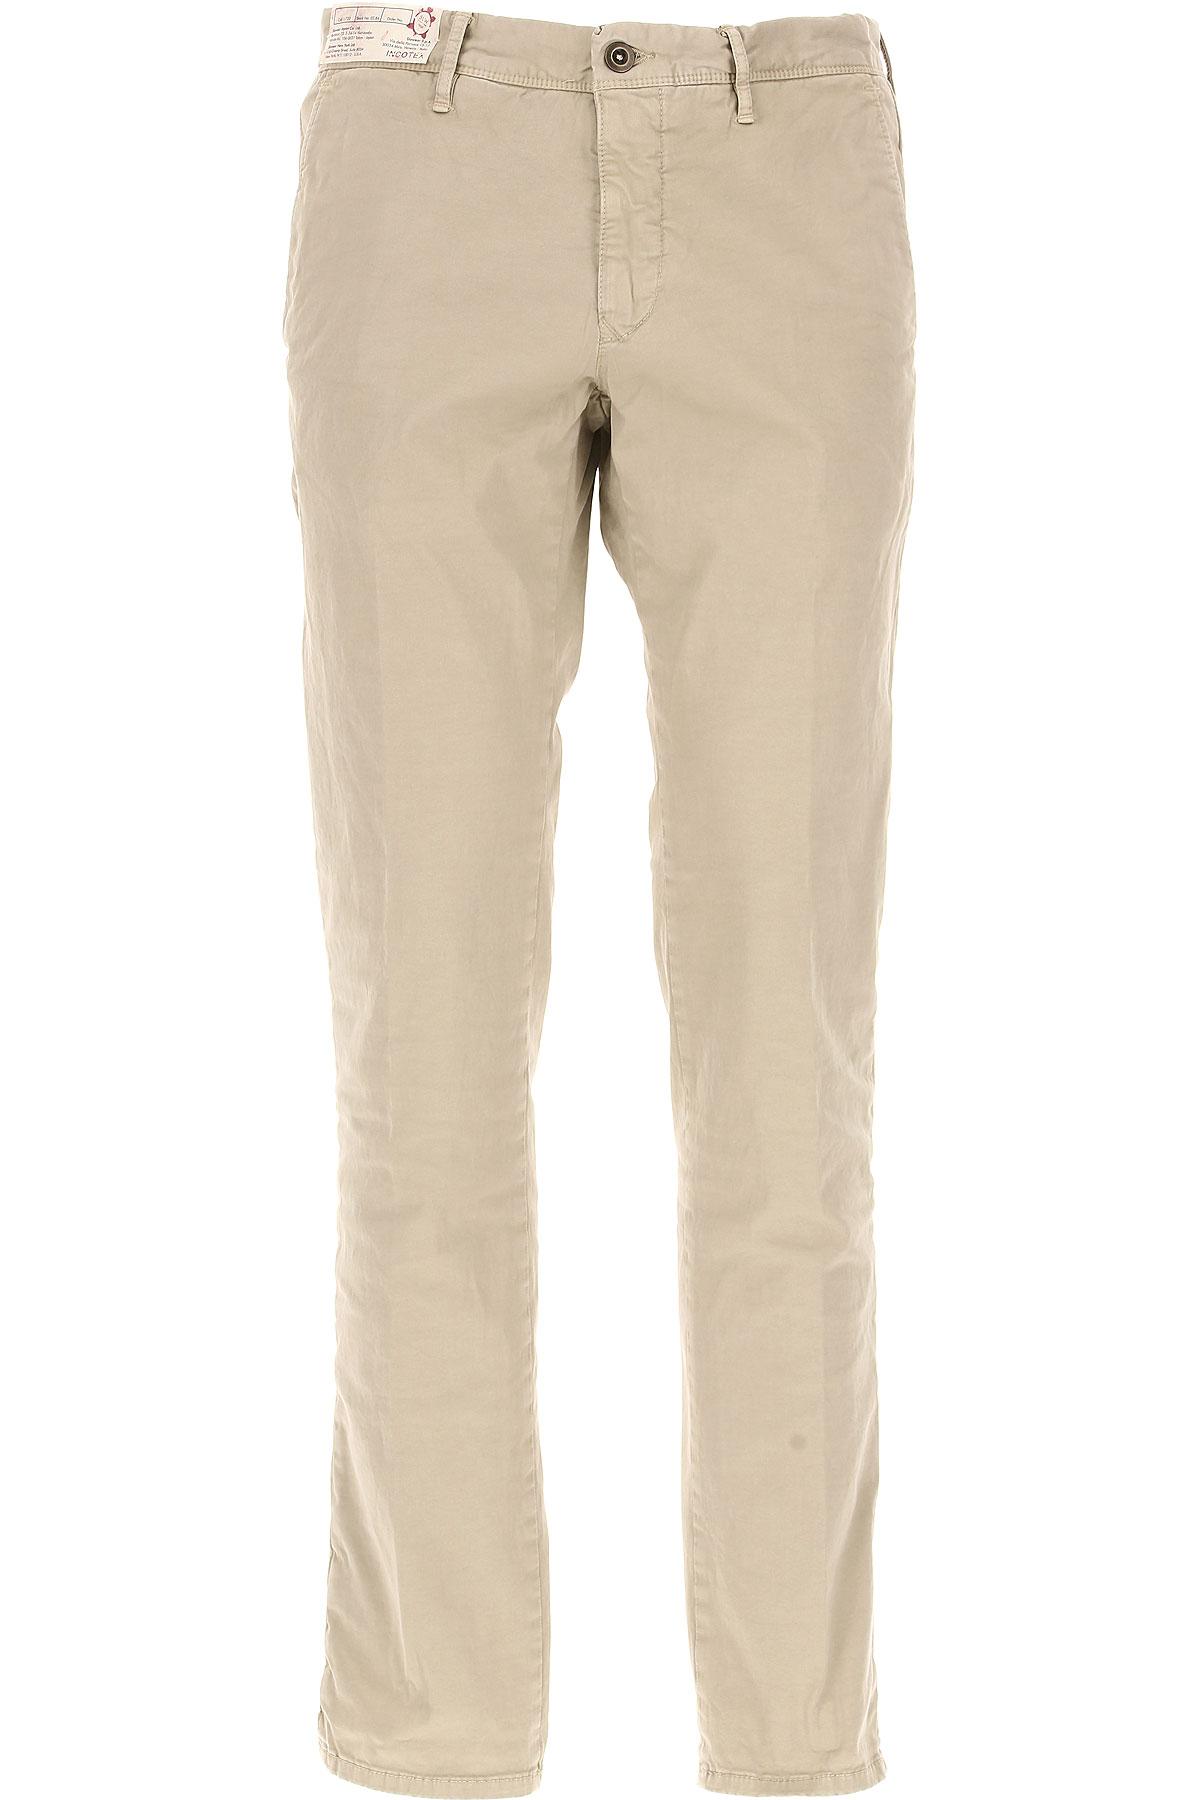 Image of Incotex Pants for Men, Beige, Cotton, 2017, 34 36